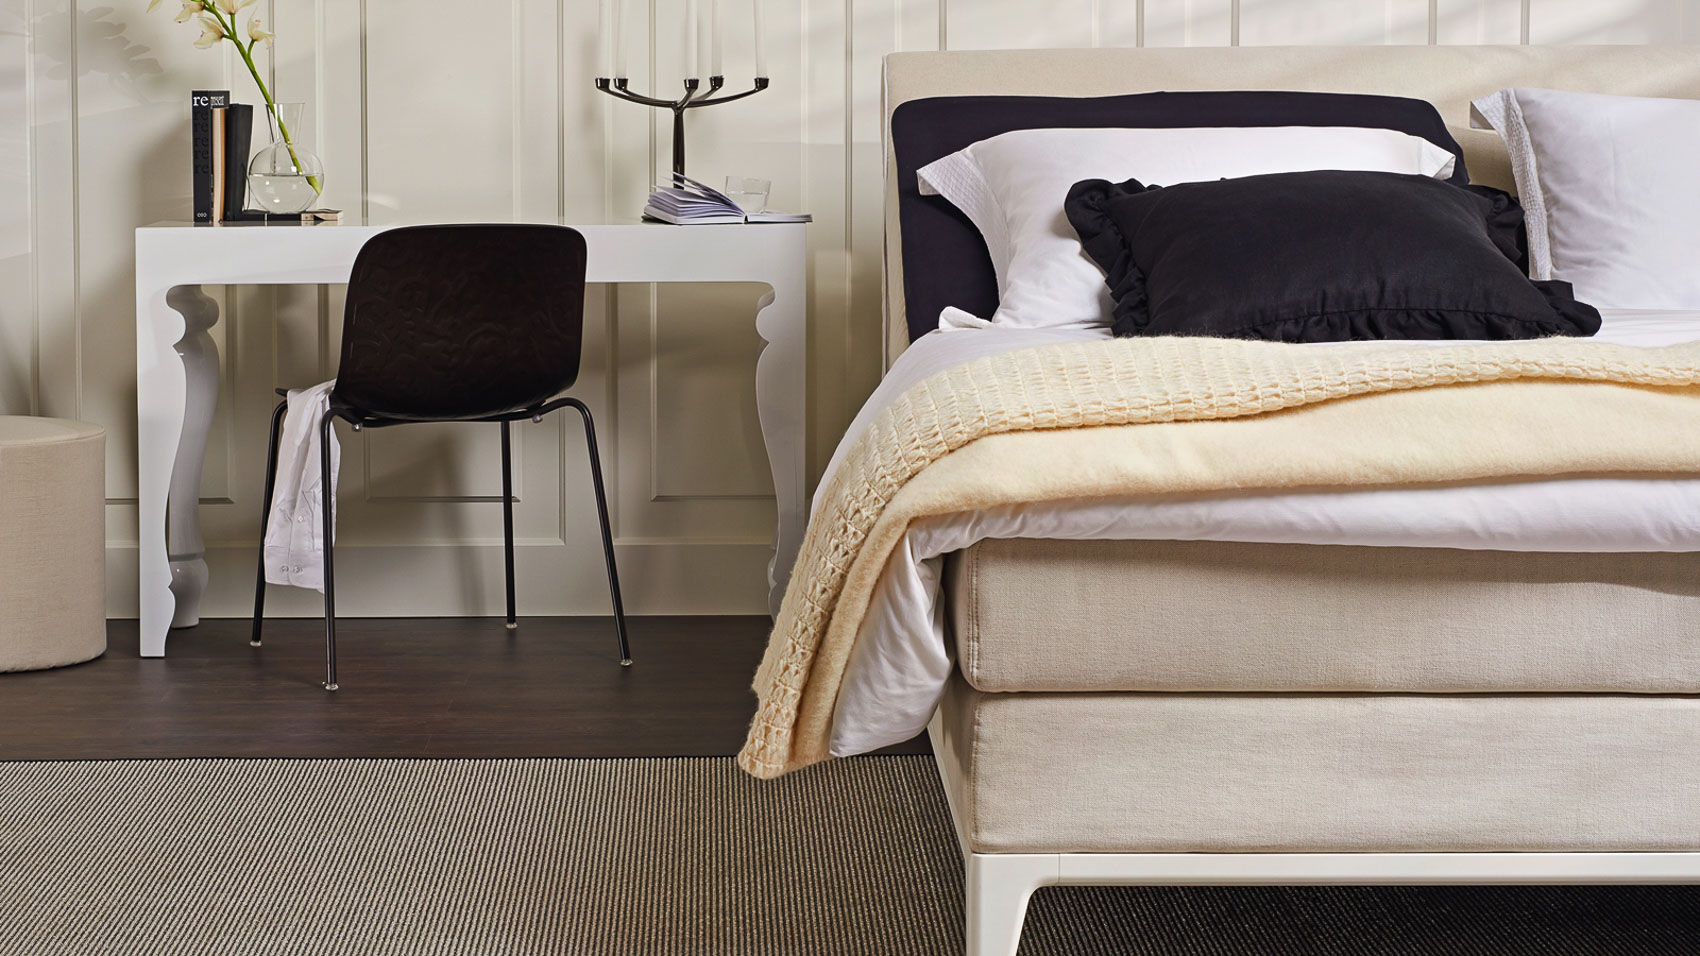 criade curl boxspringbett auping schlafzimmer und bettenhaus k rner co gmbh in n rnberg. Black Bedroom Furniture Sets. Home Design Ideas